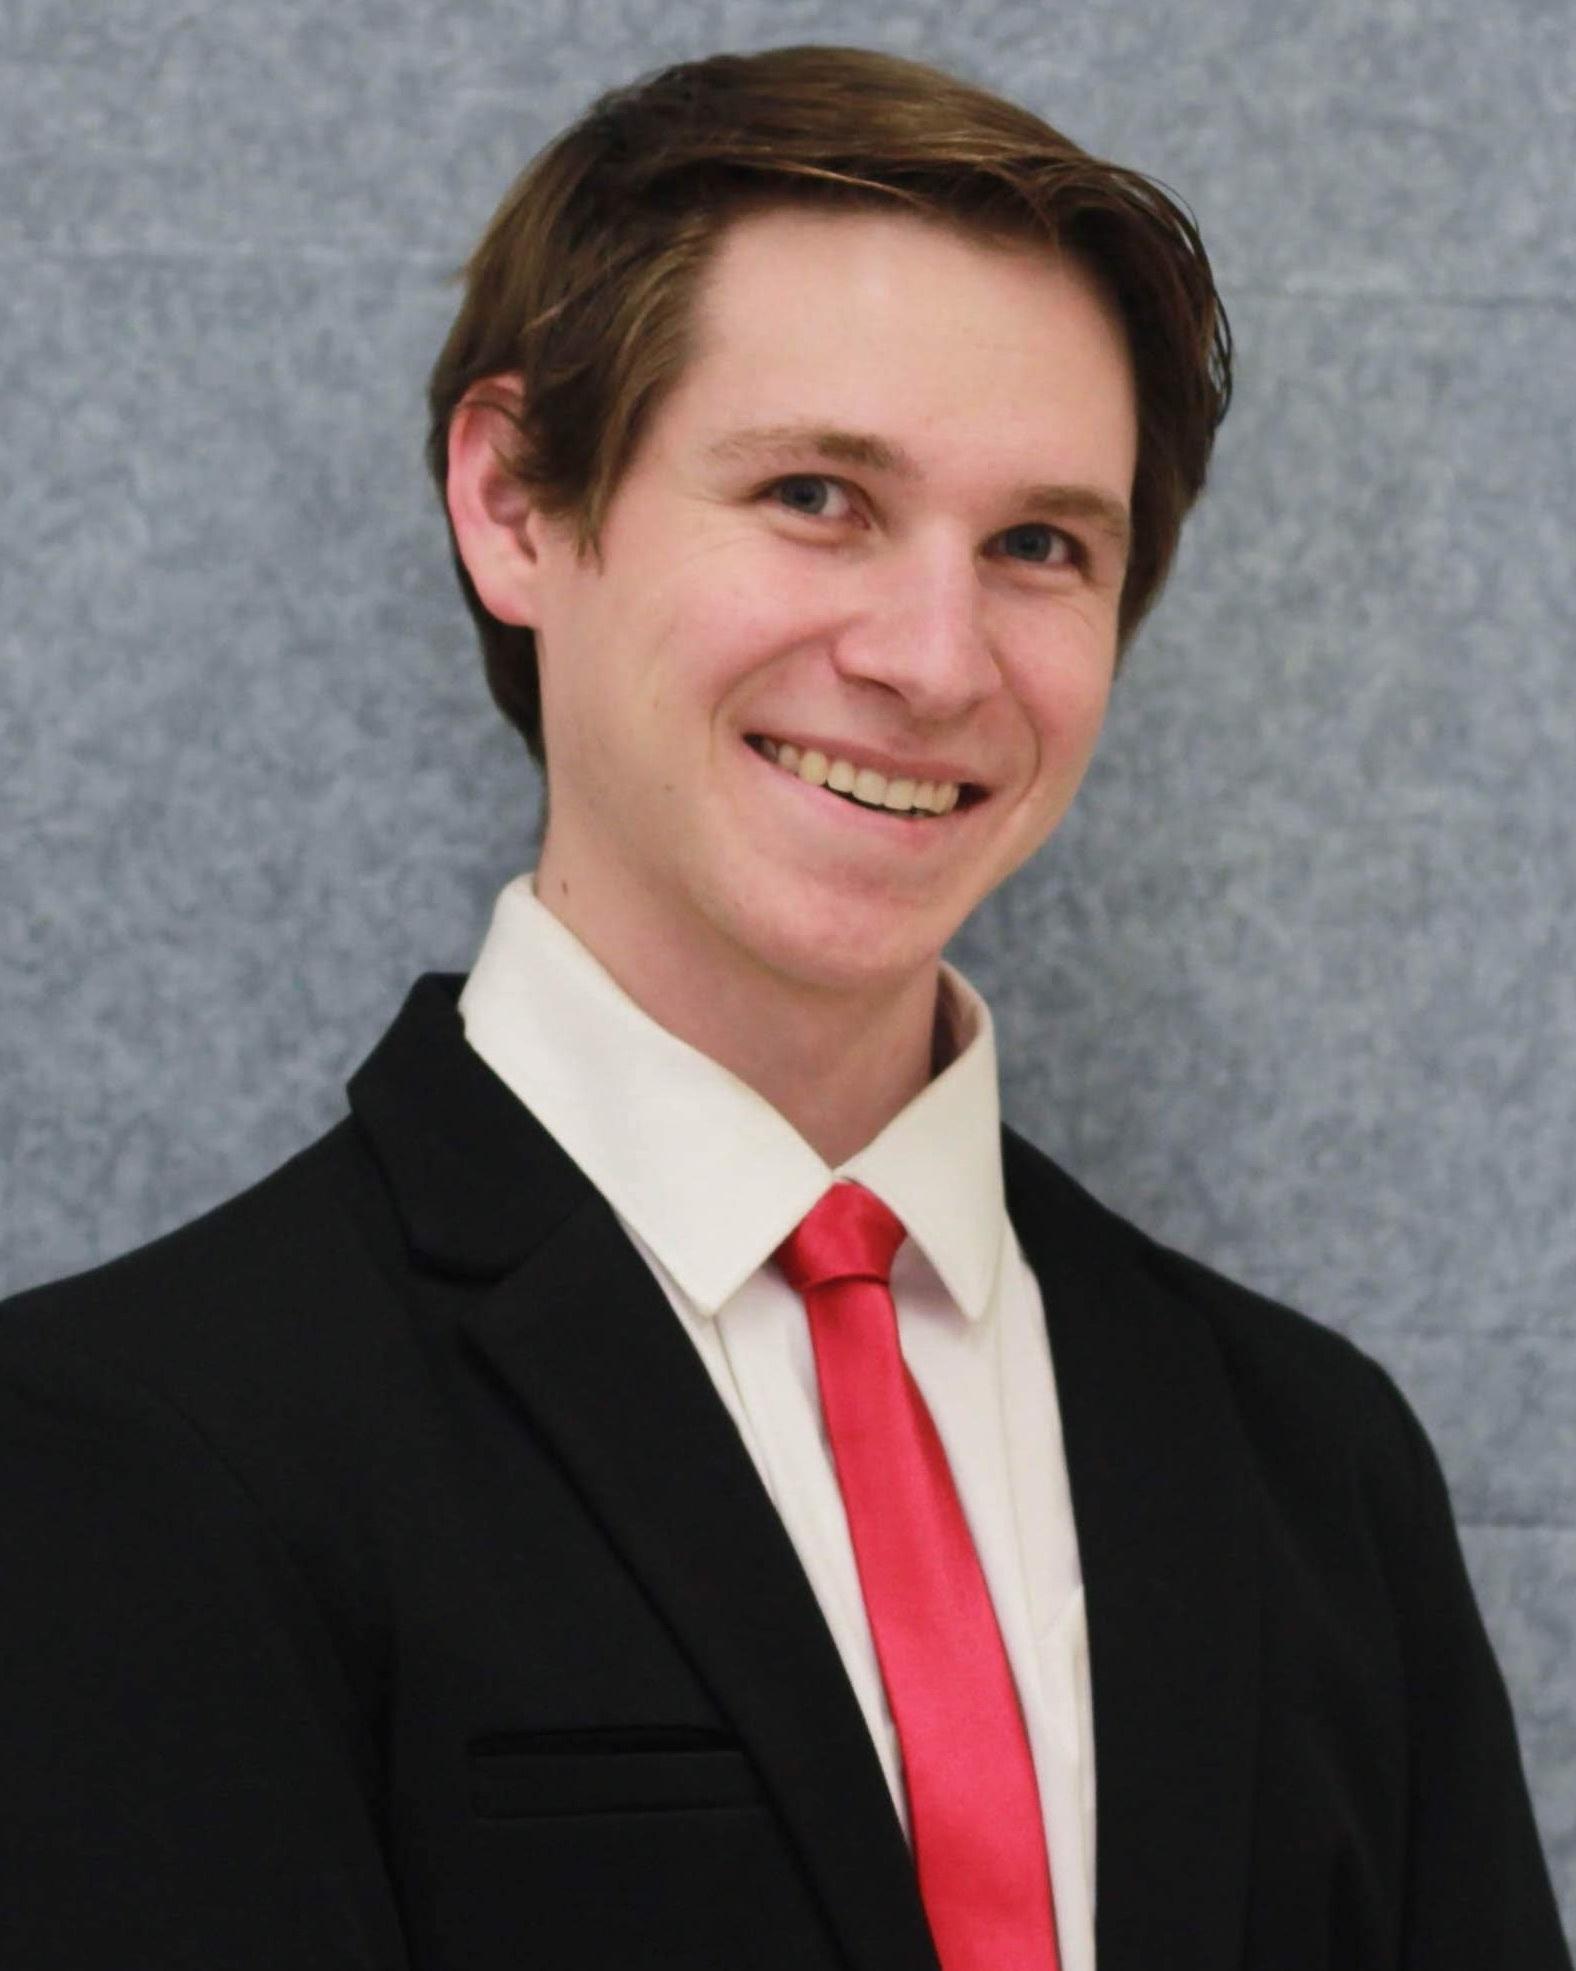 Jason Ciola - Fundraising Chair and Academic Chair